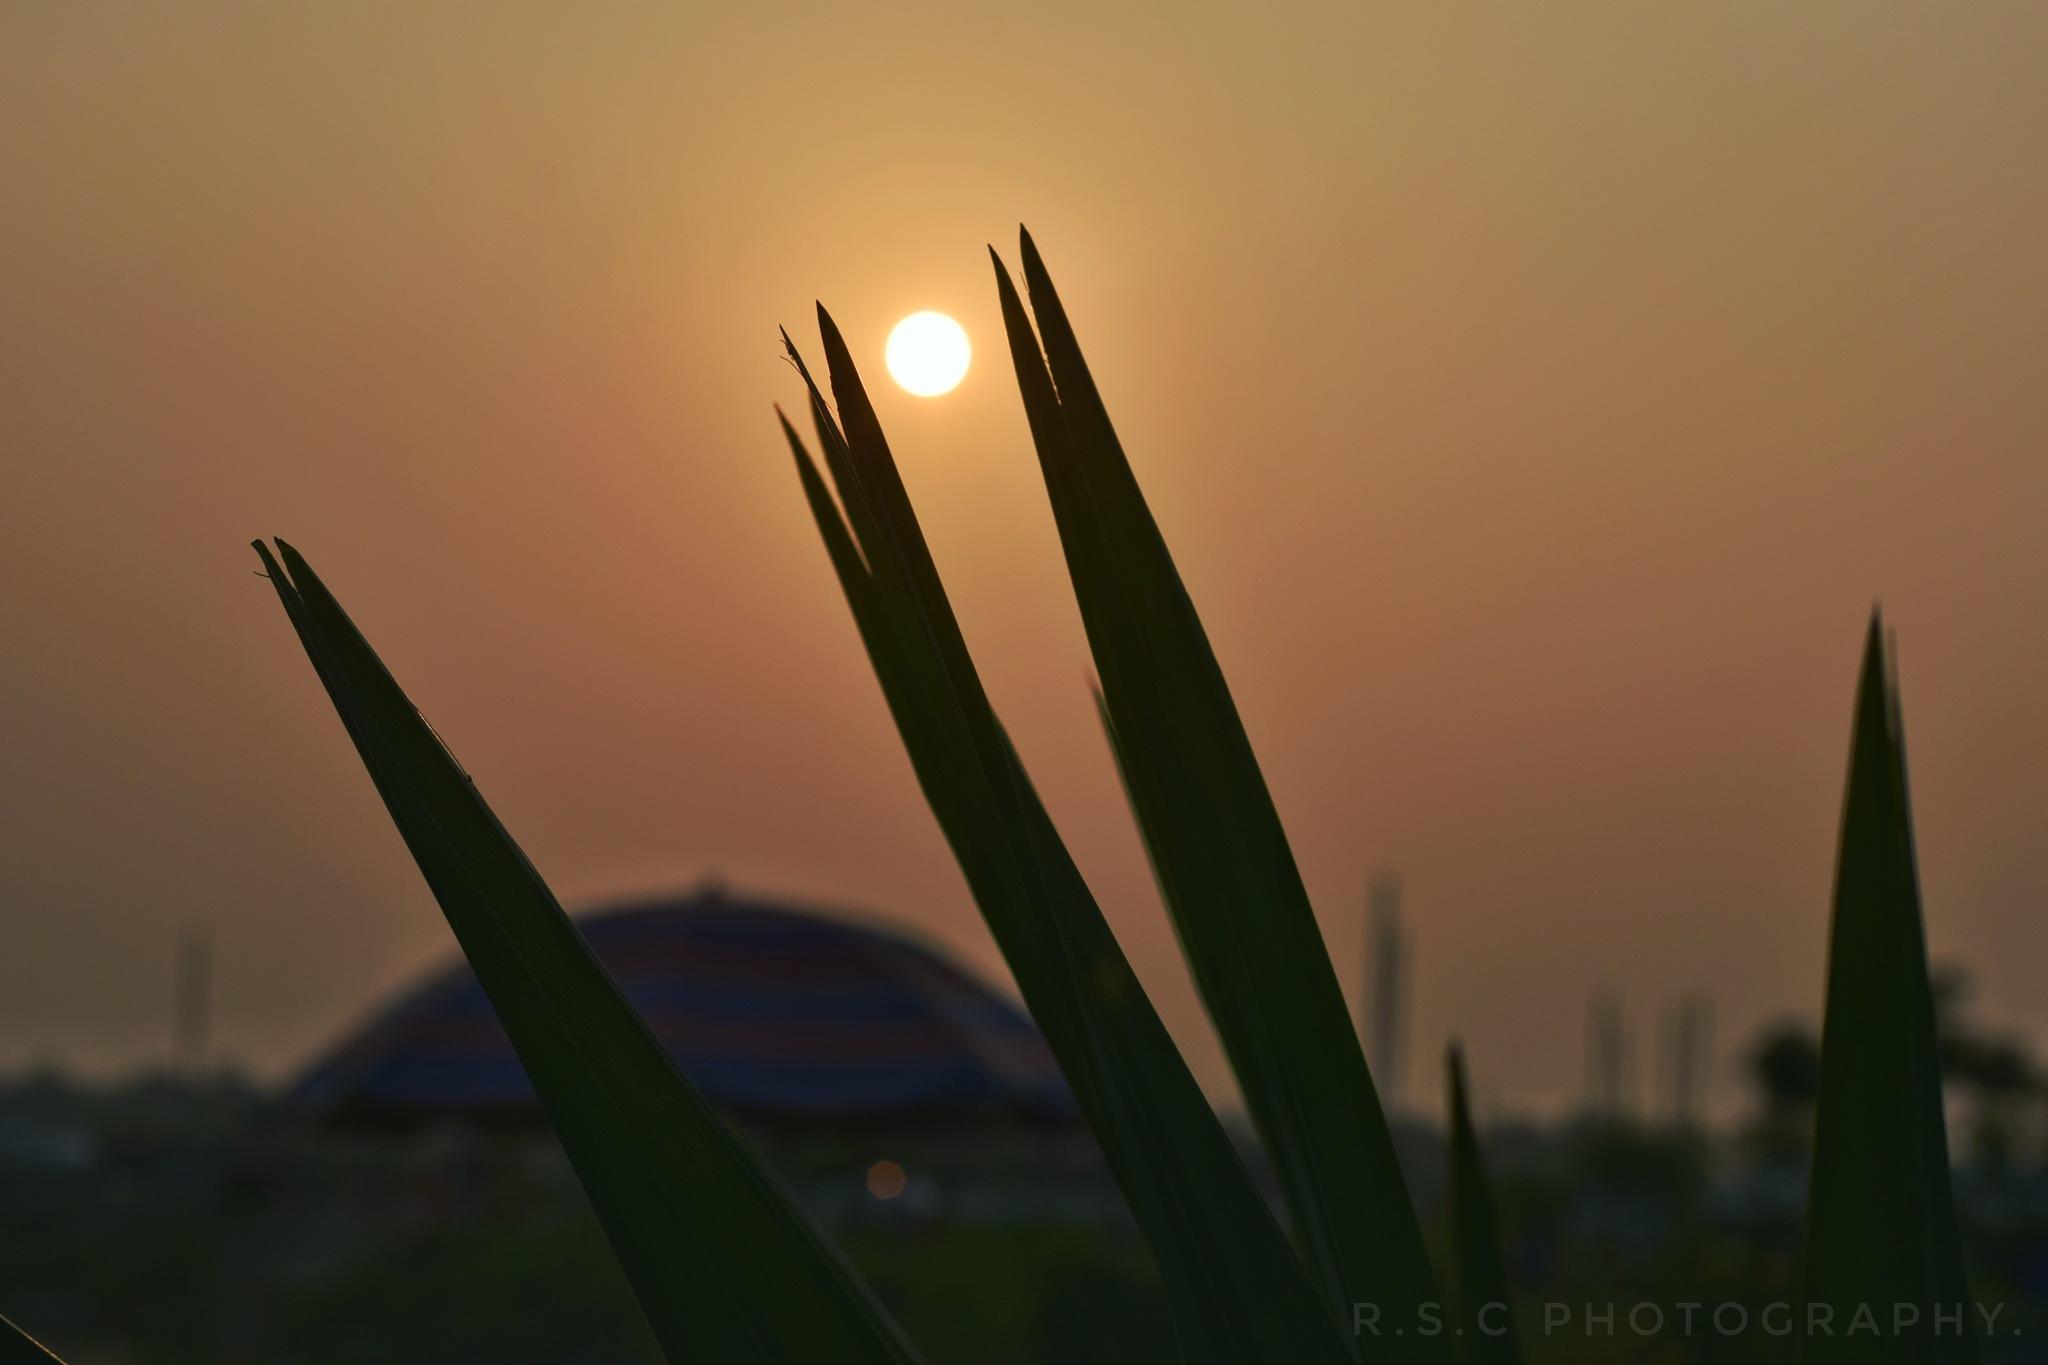 End of the day.... by Rizwanul Shams Chowdhury